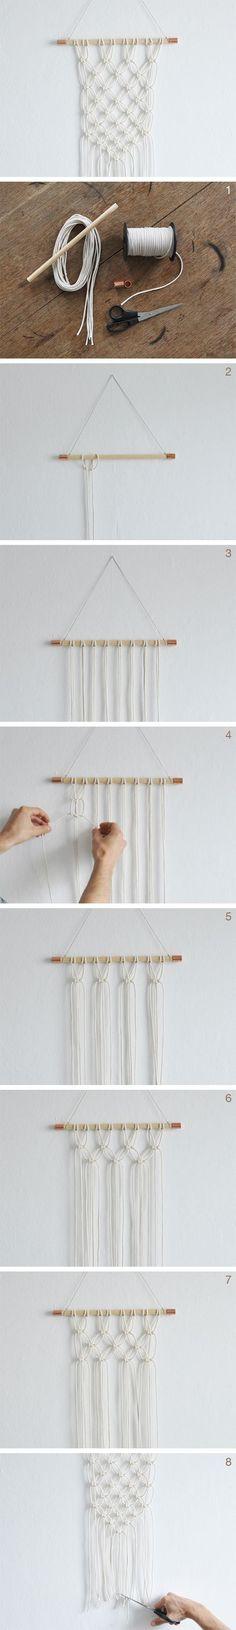 kostenlose DIY Anleitung: DIY: Makramee Wandteppich knüpfen // free DIY tutorial: how to make a macrame wall hanging via DaWanda.com: